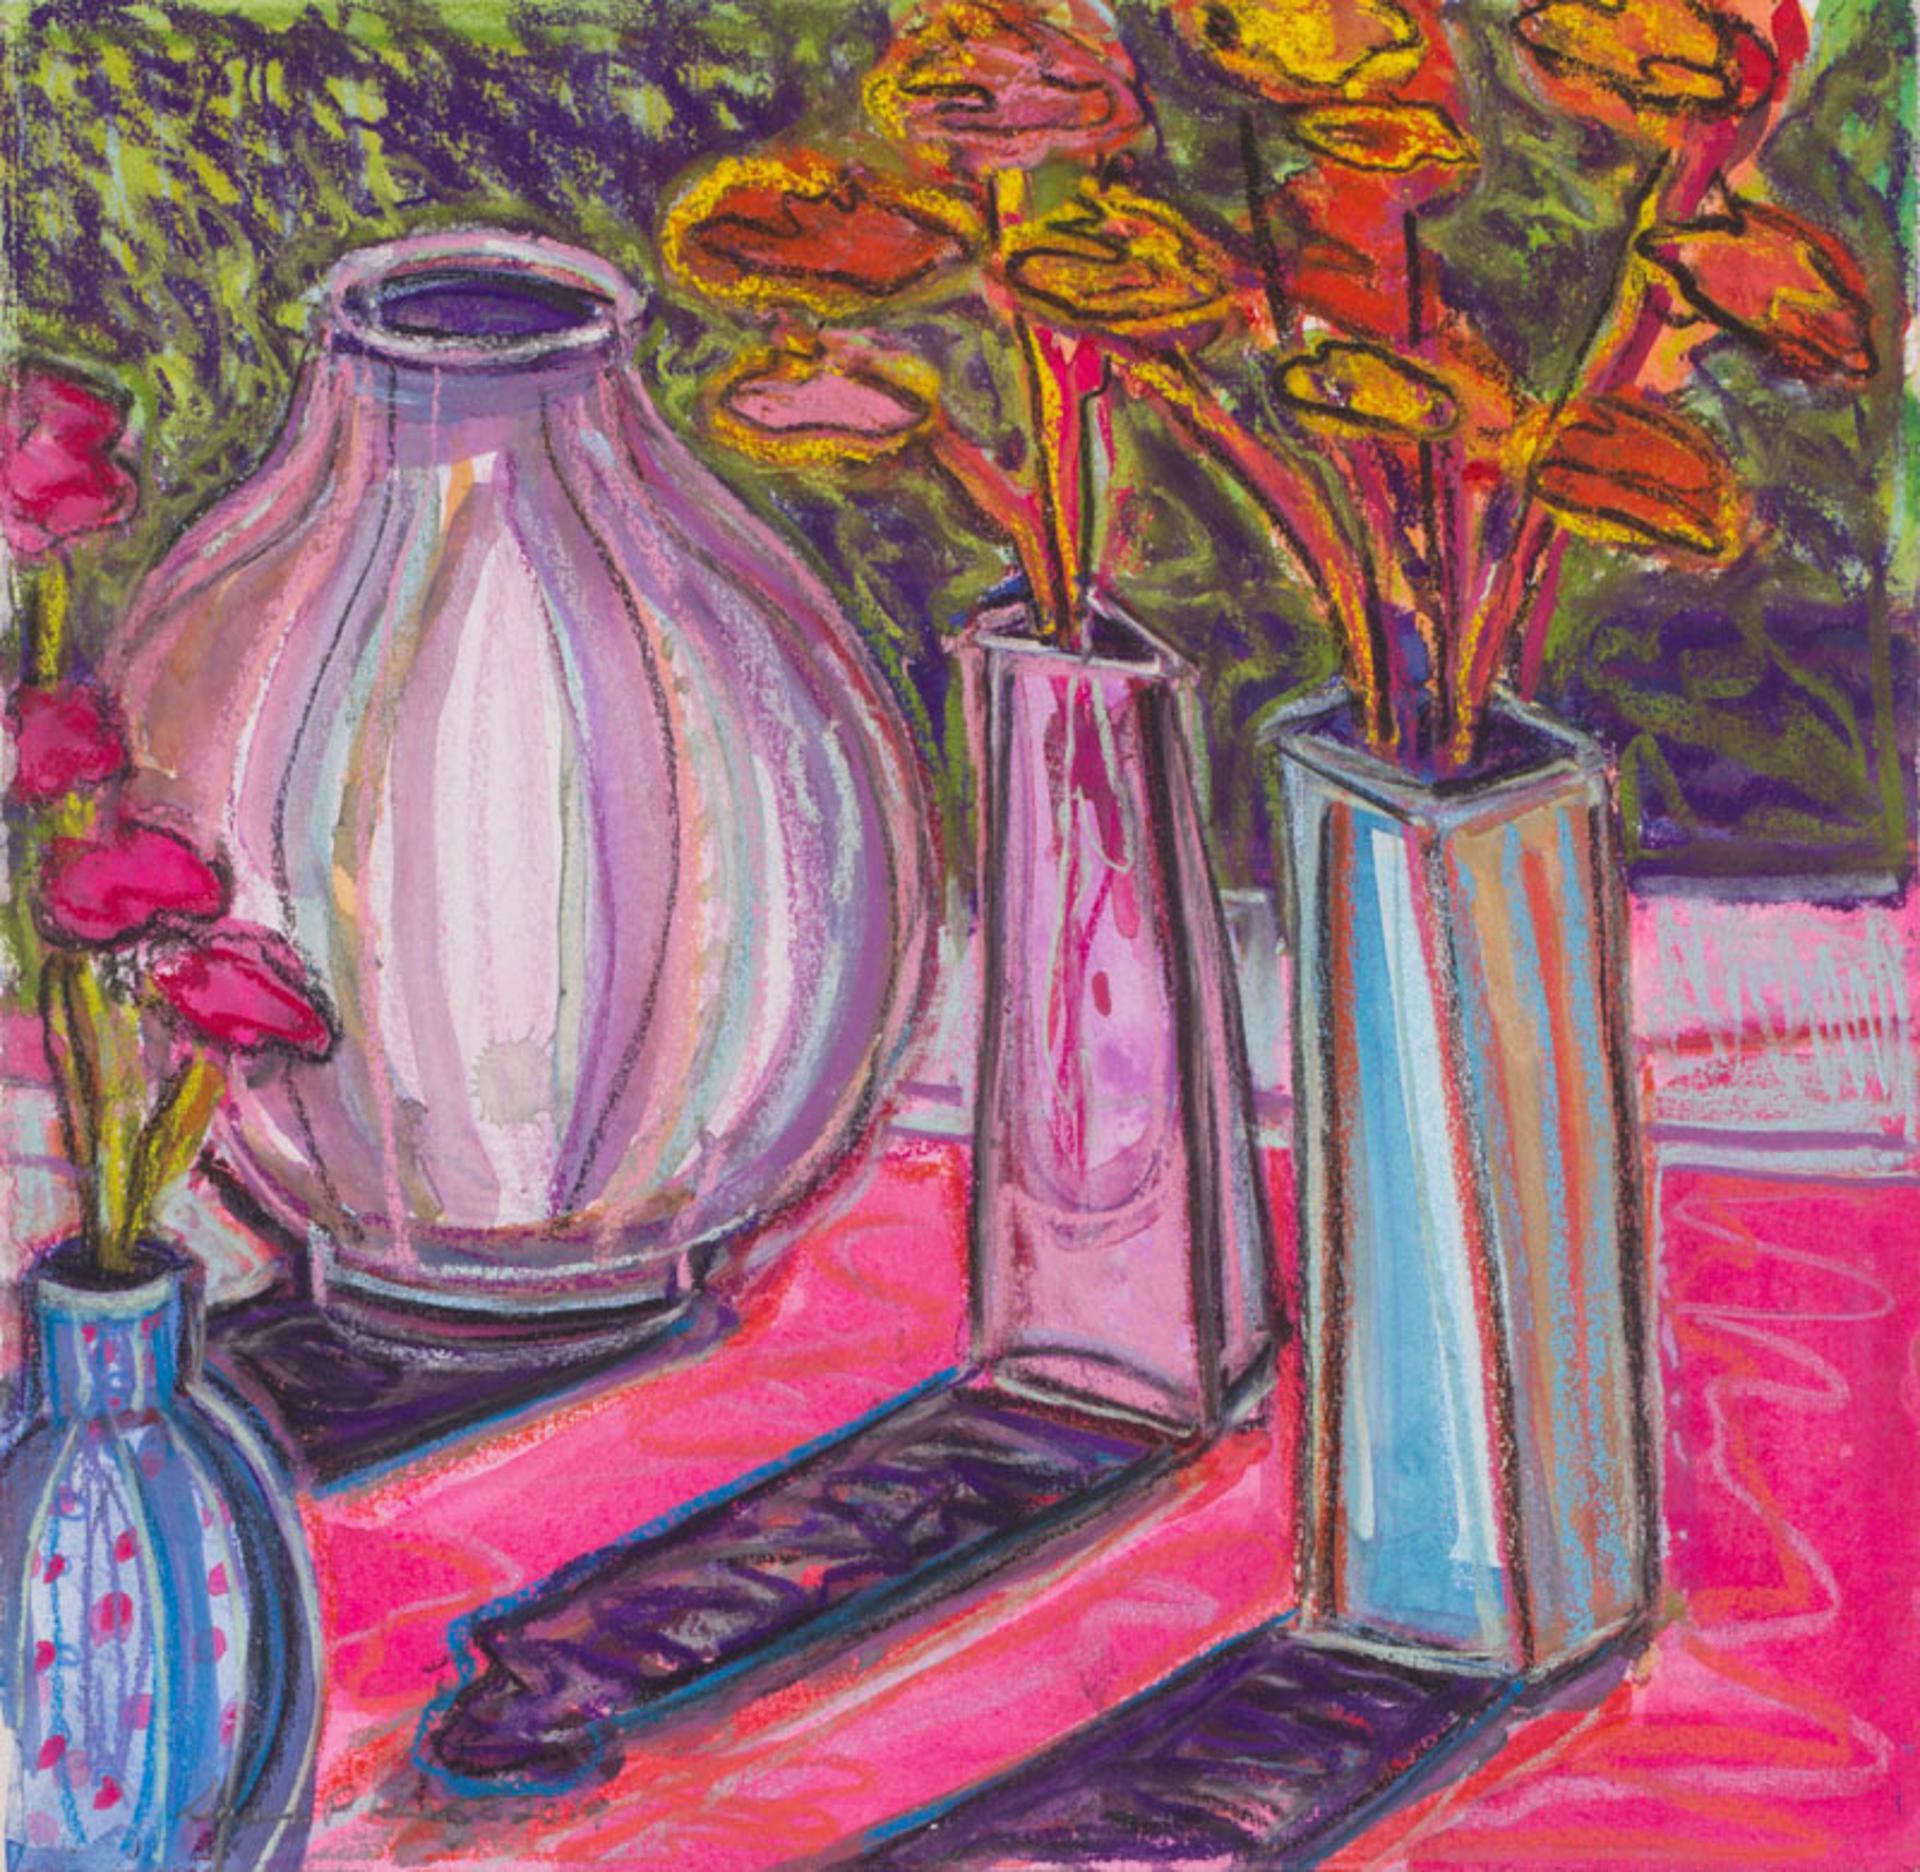 Carnations and Adler Vase II by Susan Puelz